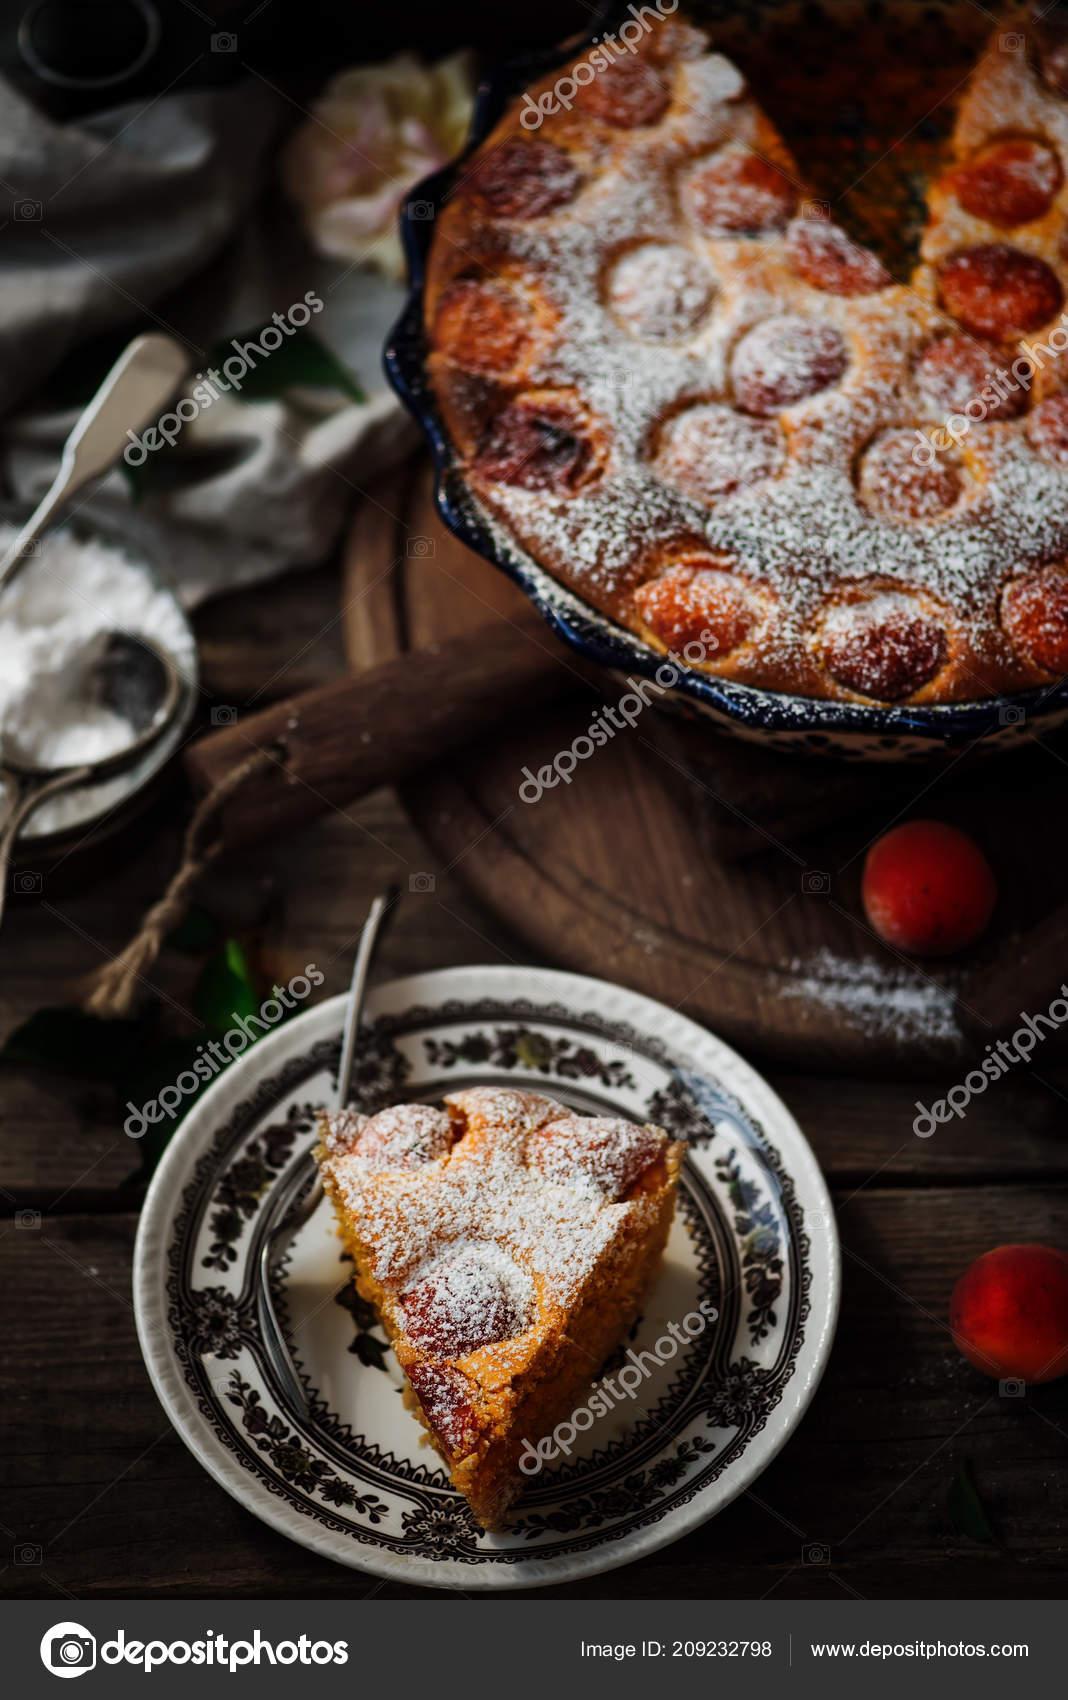 Aprikose Weichen Kuchen Dunkle Rustikale Photo Selective Fokus